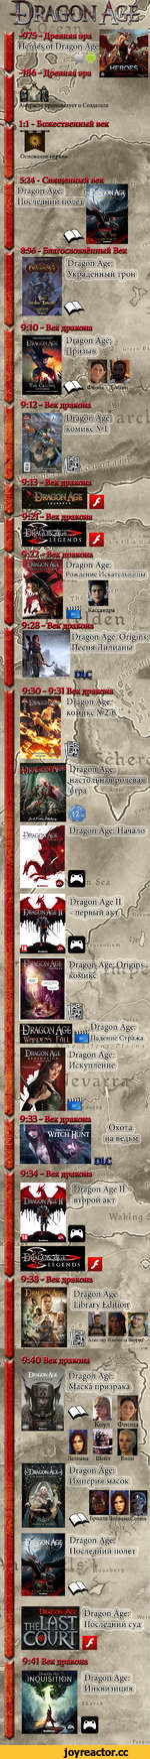 I I AN I M IRC III f HE Caluhc, ~*Aji «limite bitto* f. Hiran REDEMPTION mu~ HlltlA DAY Heroes 0Ï Dragon Age о Создателе Основание ¿ill Dragon Age: Щ Последний полет Dragon Age: Украденный трон Dragon Age Призыв Фиона Dragon Age: Д ^ Рождение Искательницы bocks Dragon Age: Orij t '